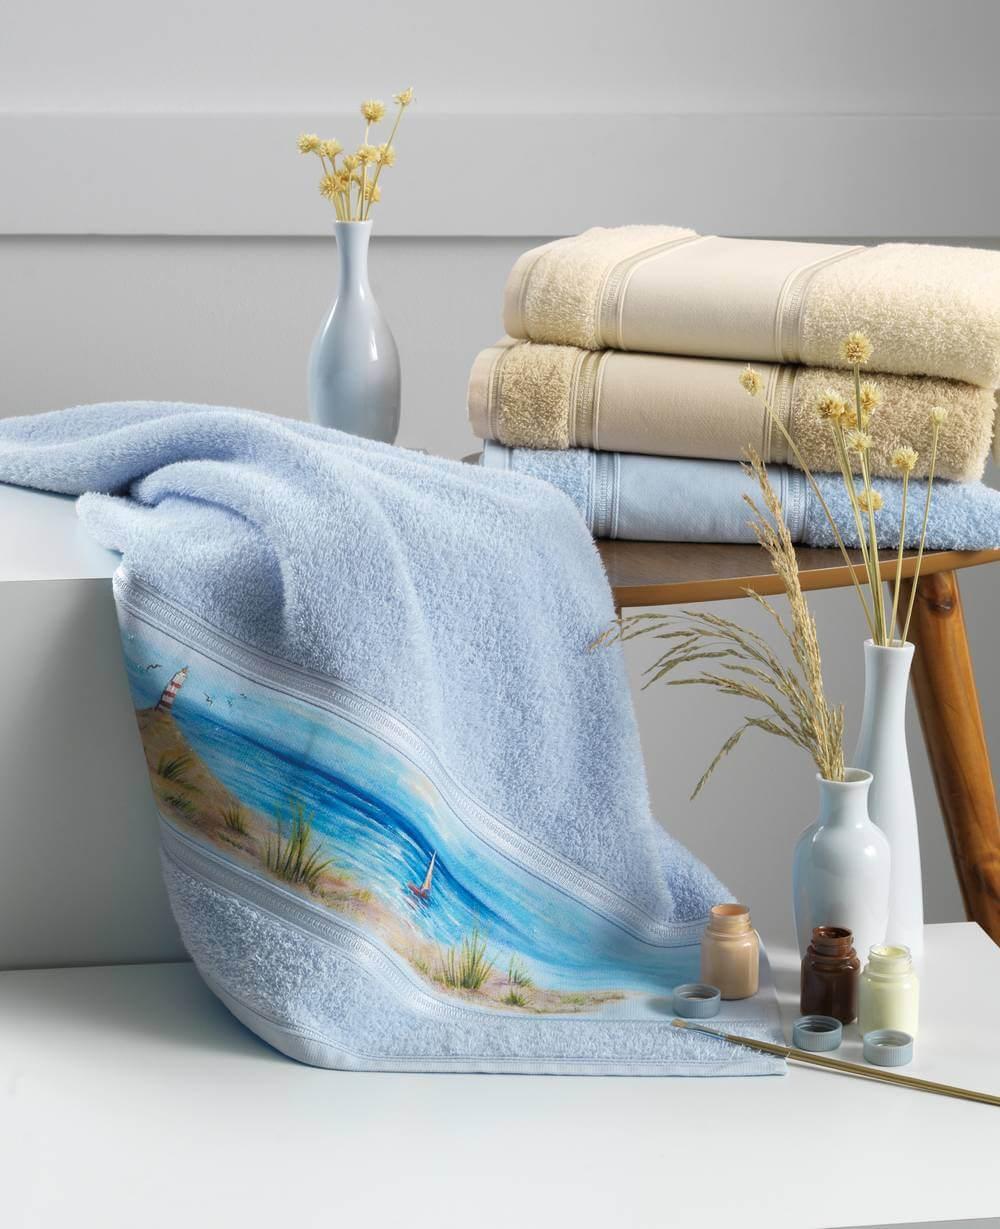 Toalha de Banho para Pintar Karsten Bruna II - Gramatura: 370g/m²